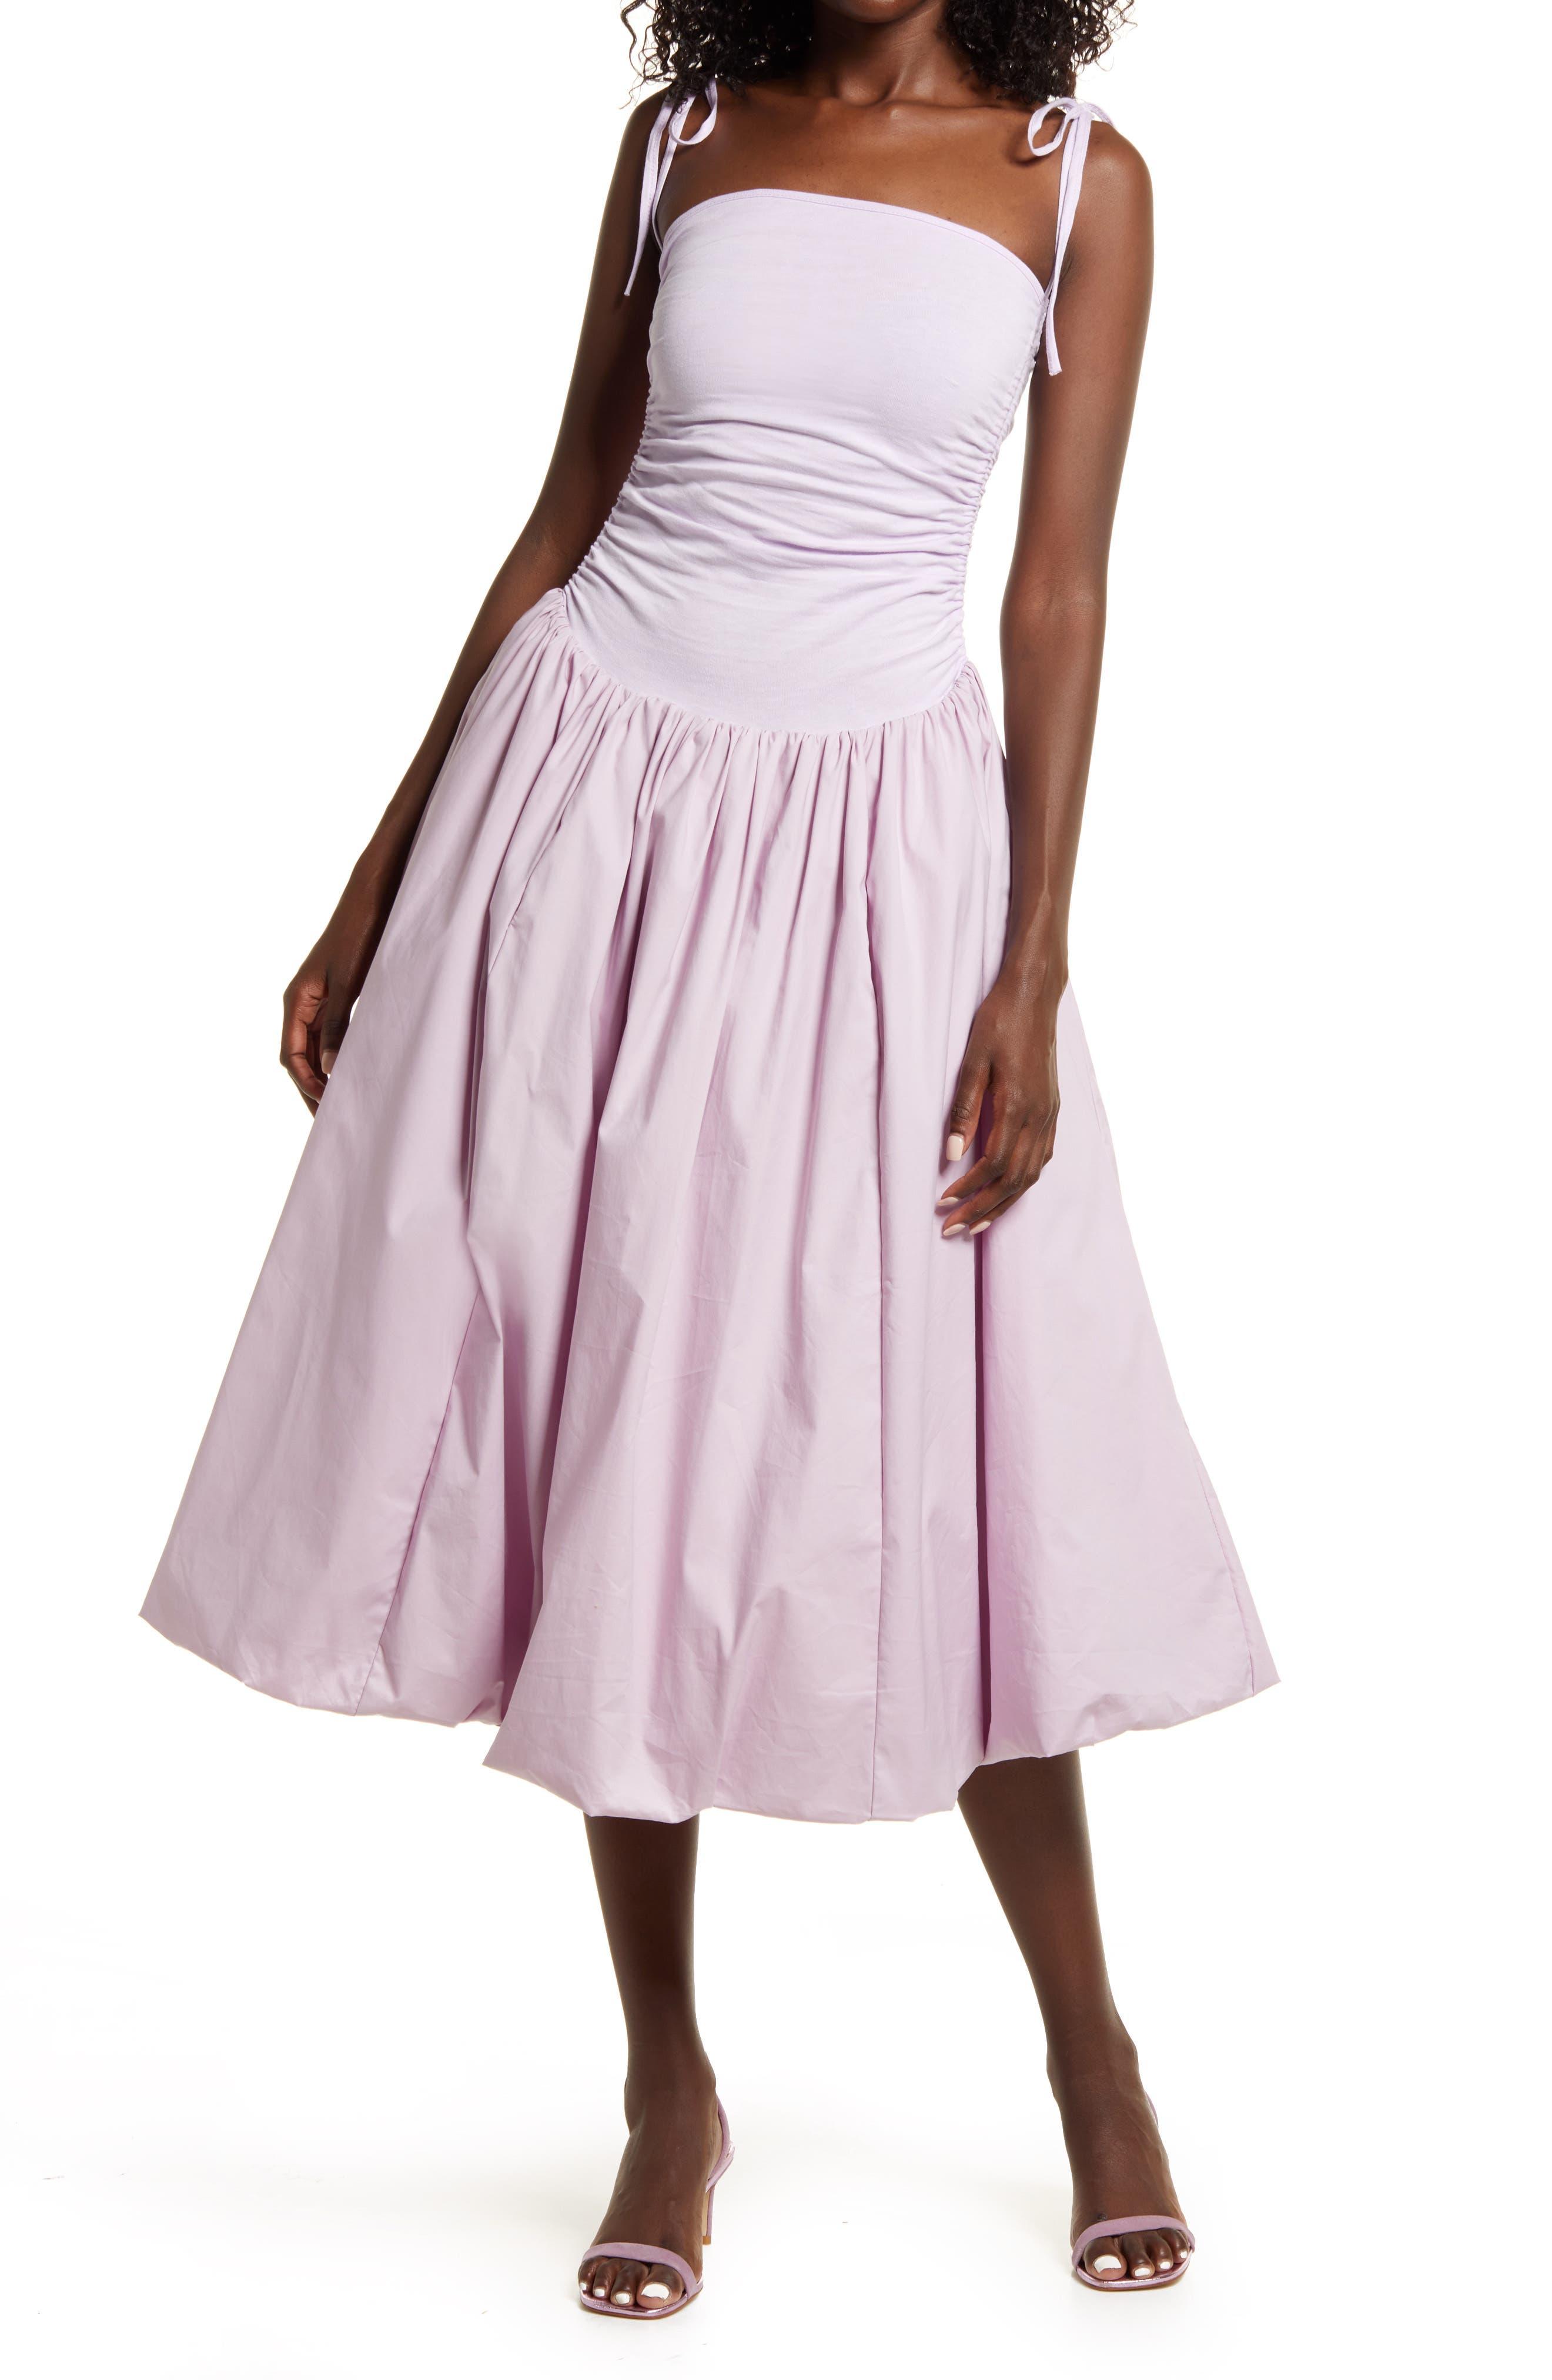 80s Dresses | Casual to Party Dresses Womens Amy Lynn Tie Shoulder Midi Dress Size Large - Purple $112.00 AT vintagedancer.com